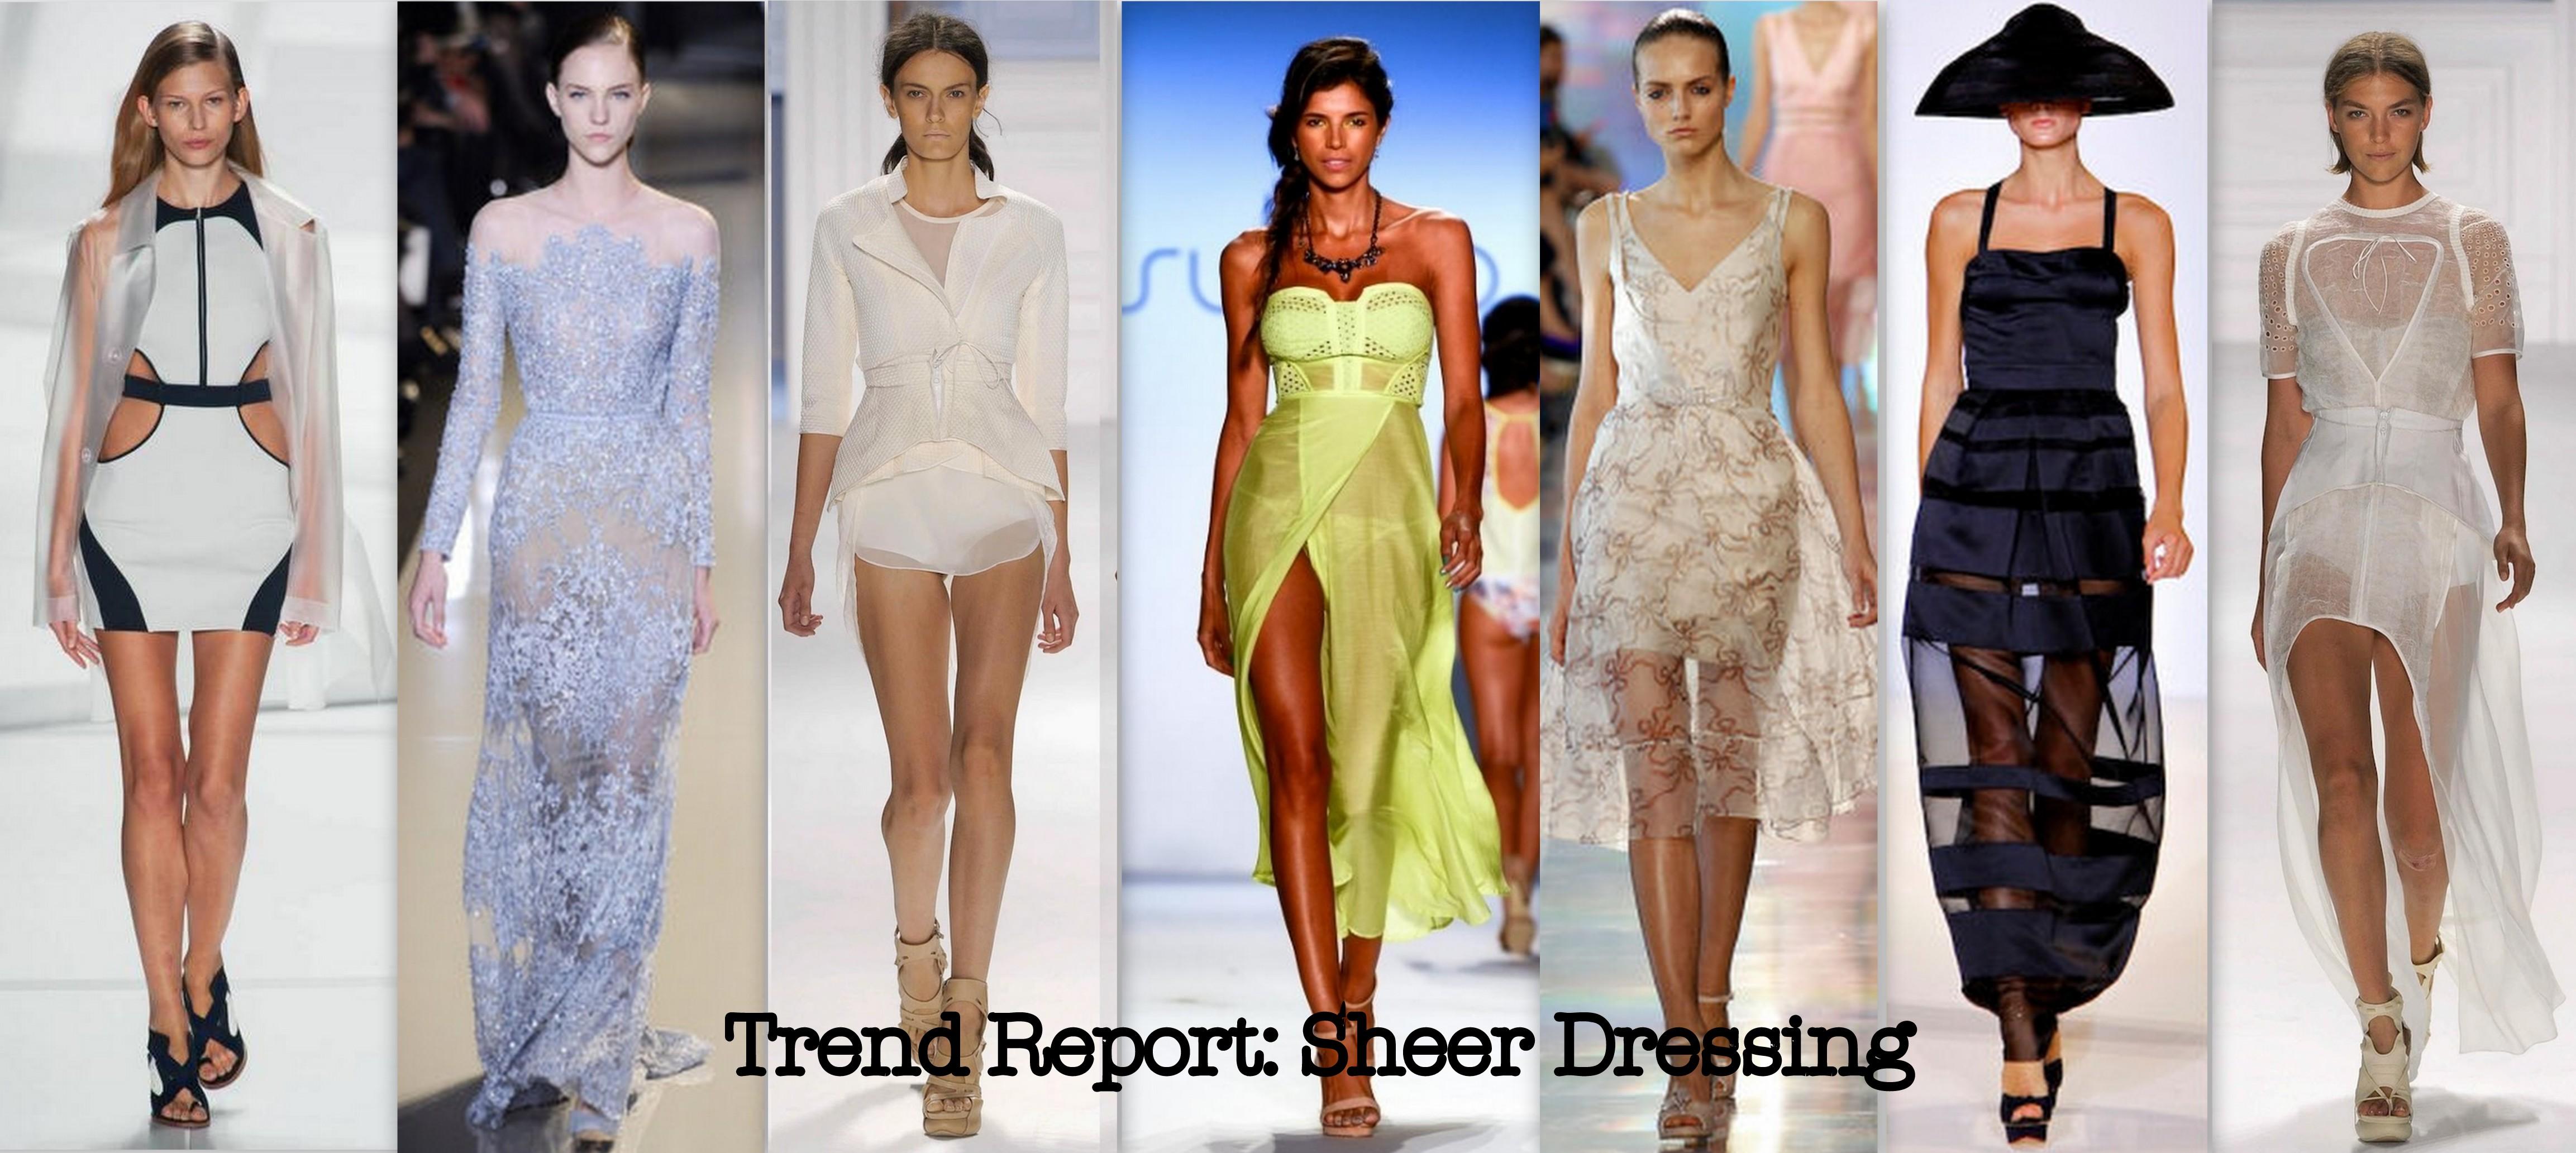 Question #14: Transparent Clothes: Sheer Genius or Ridiculousness?